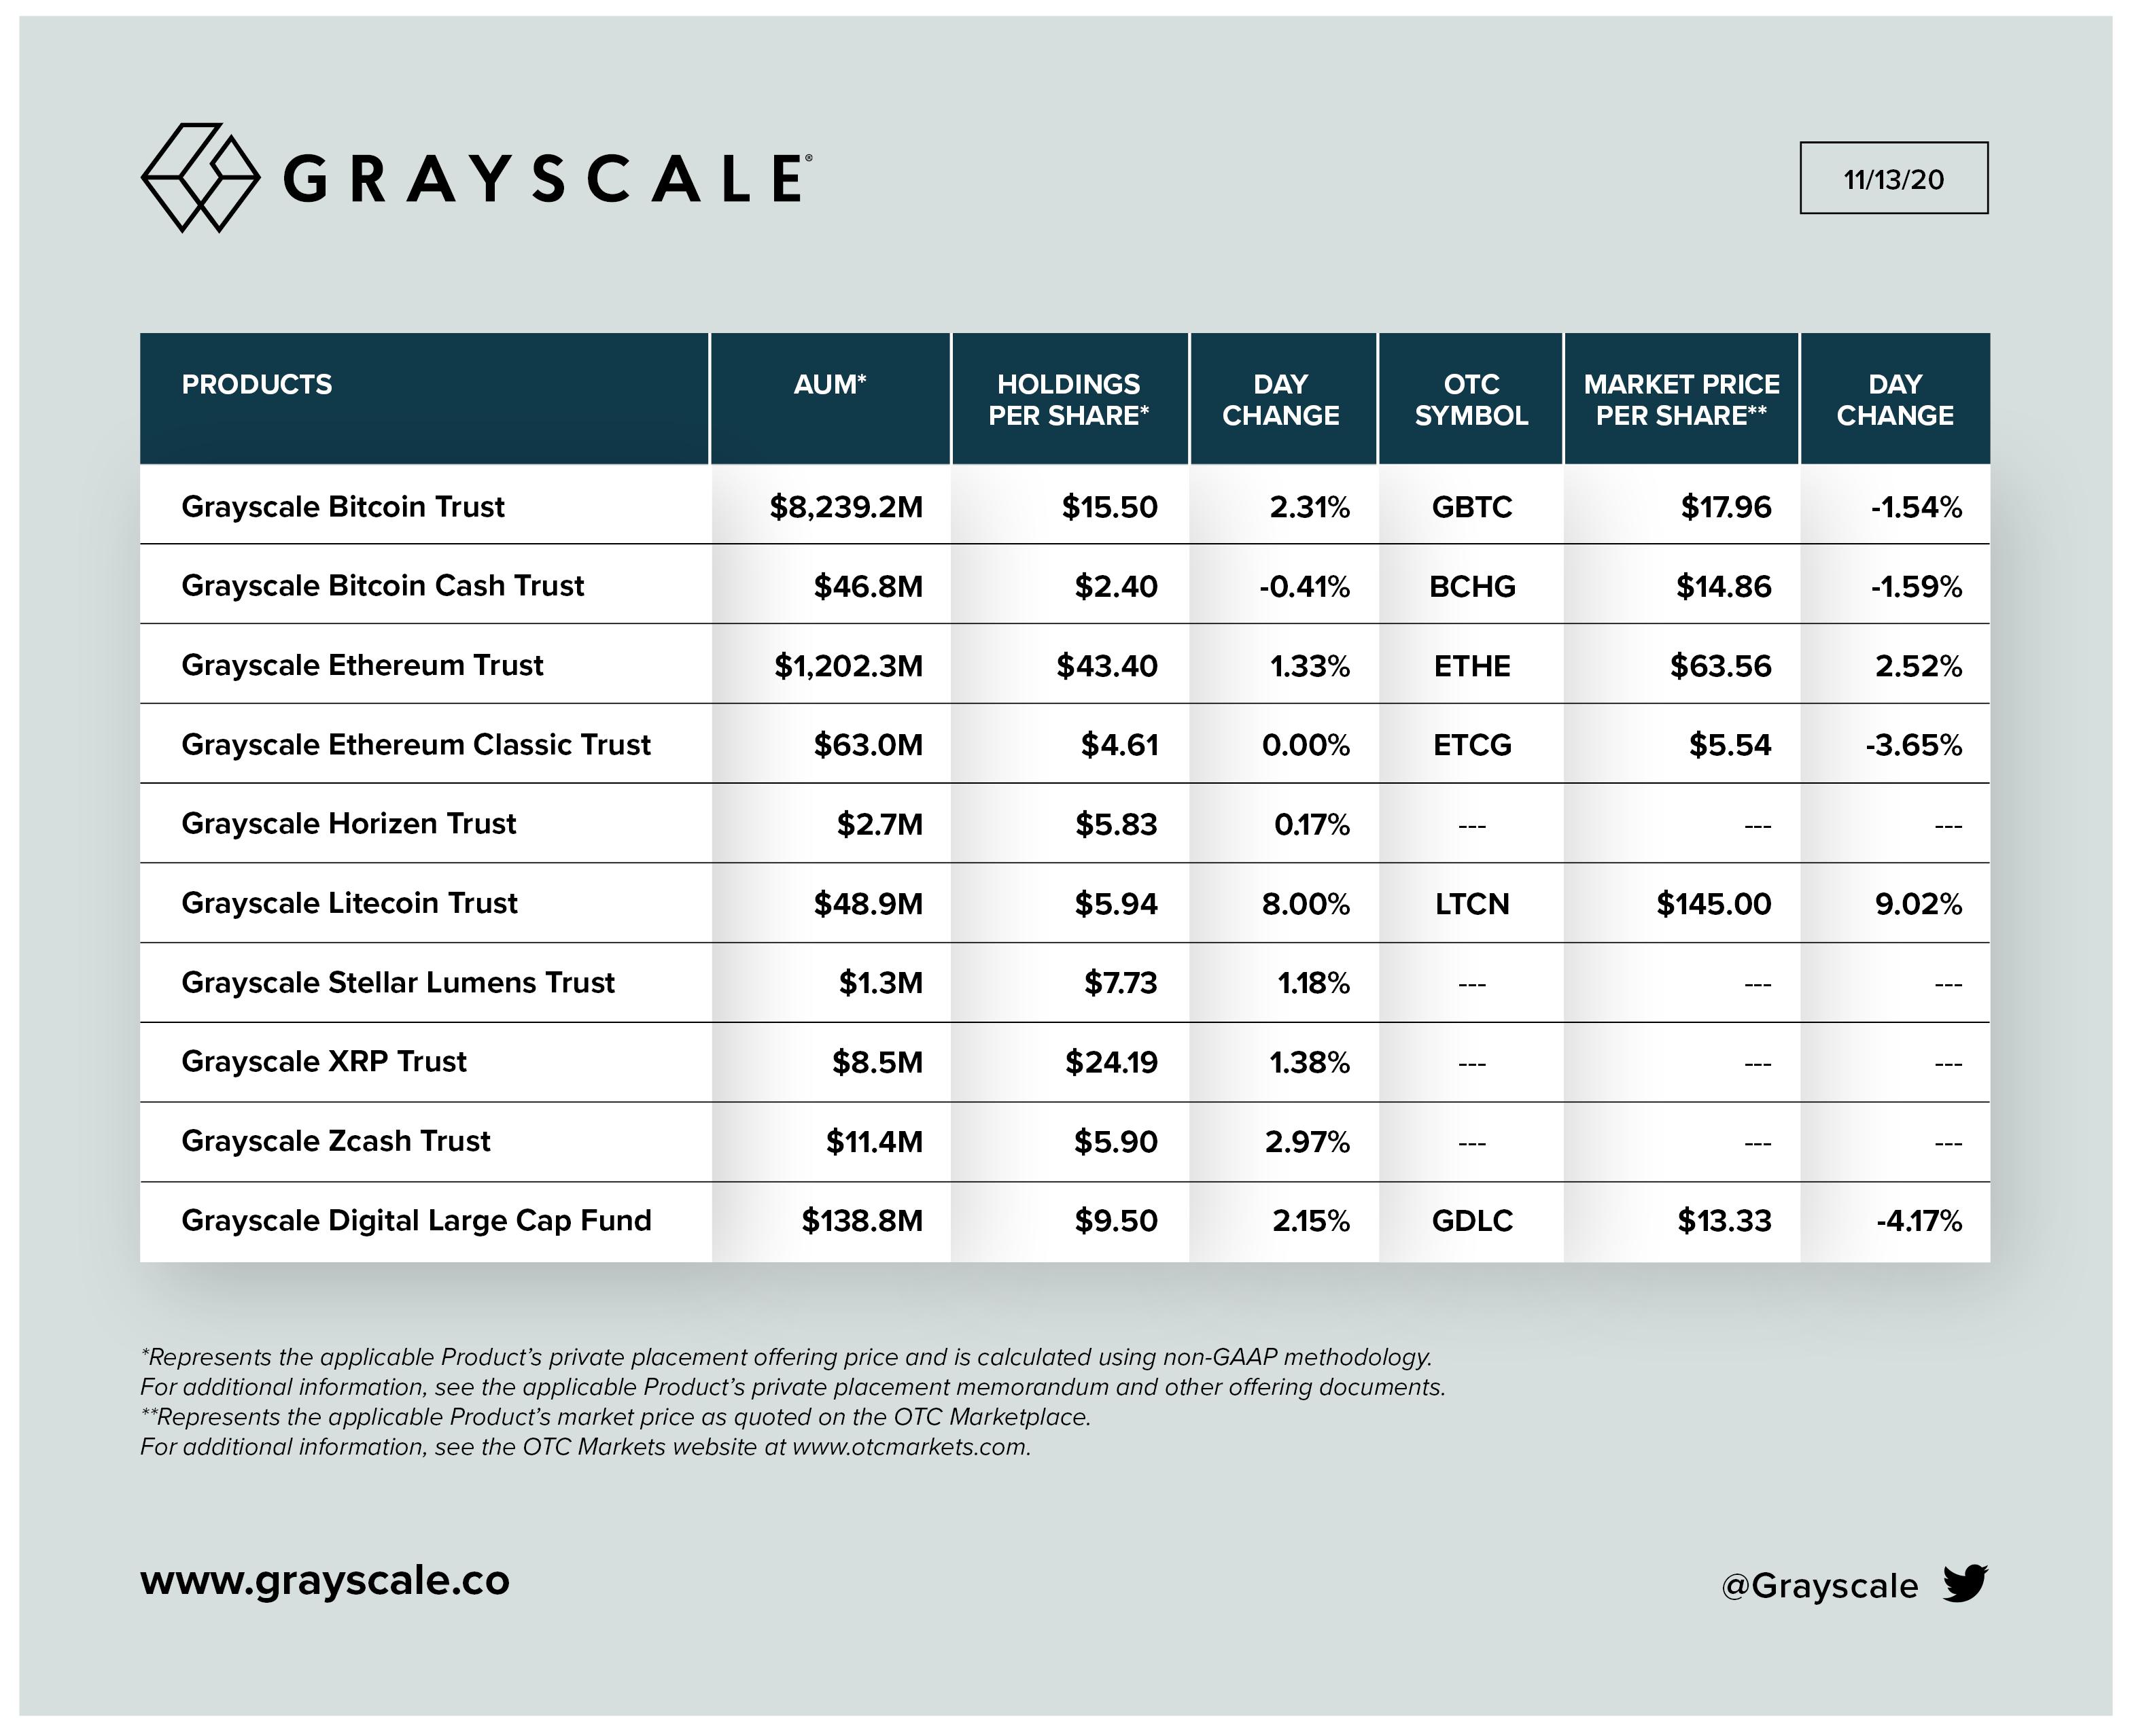 Grayscale再买入7223个比特币,持有总量超过50万里程碑